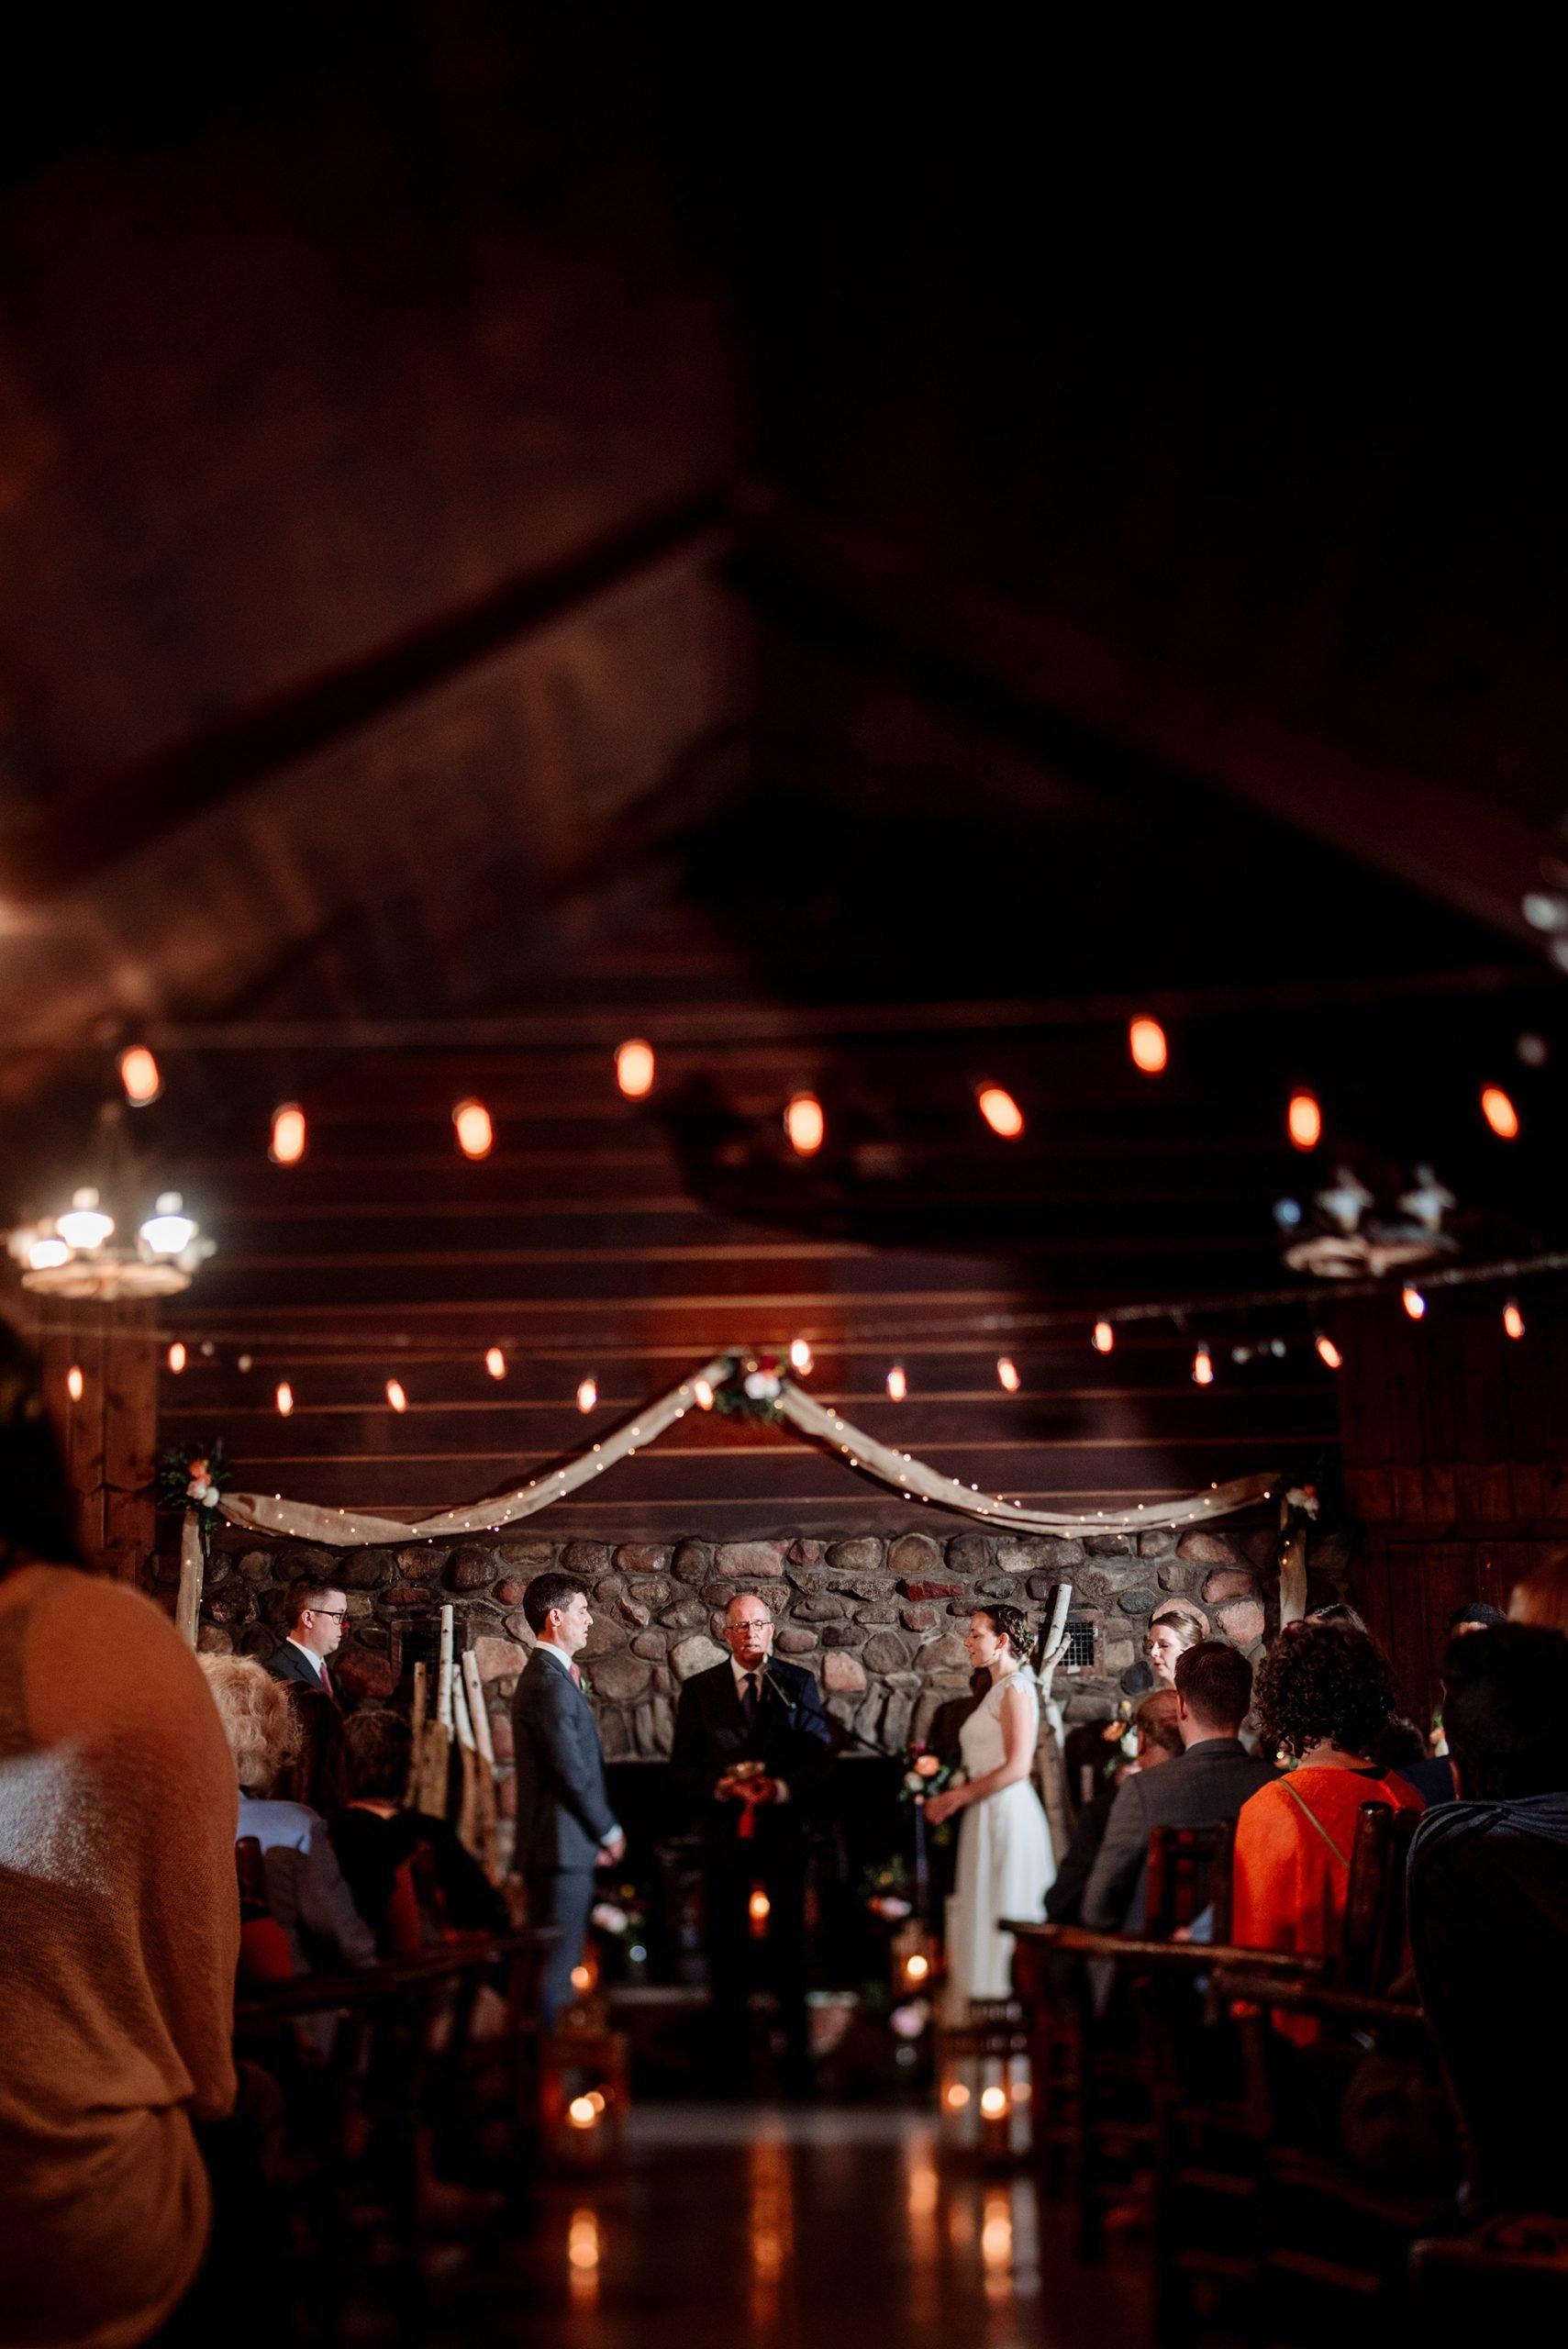 Indoor lodge wedding